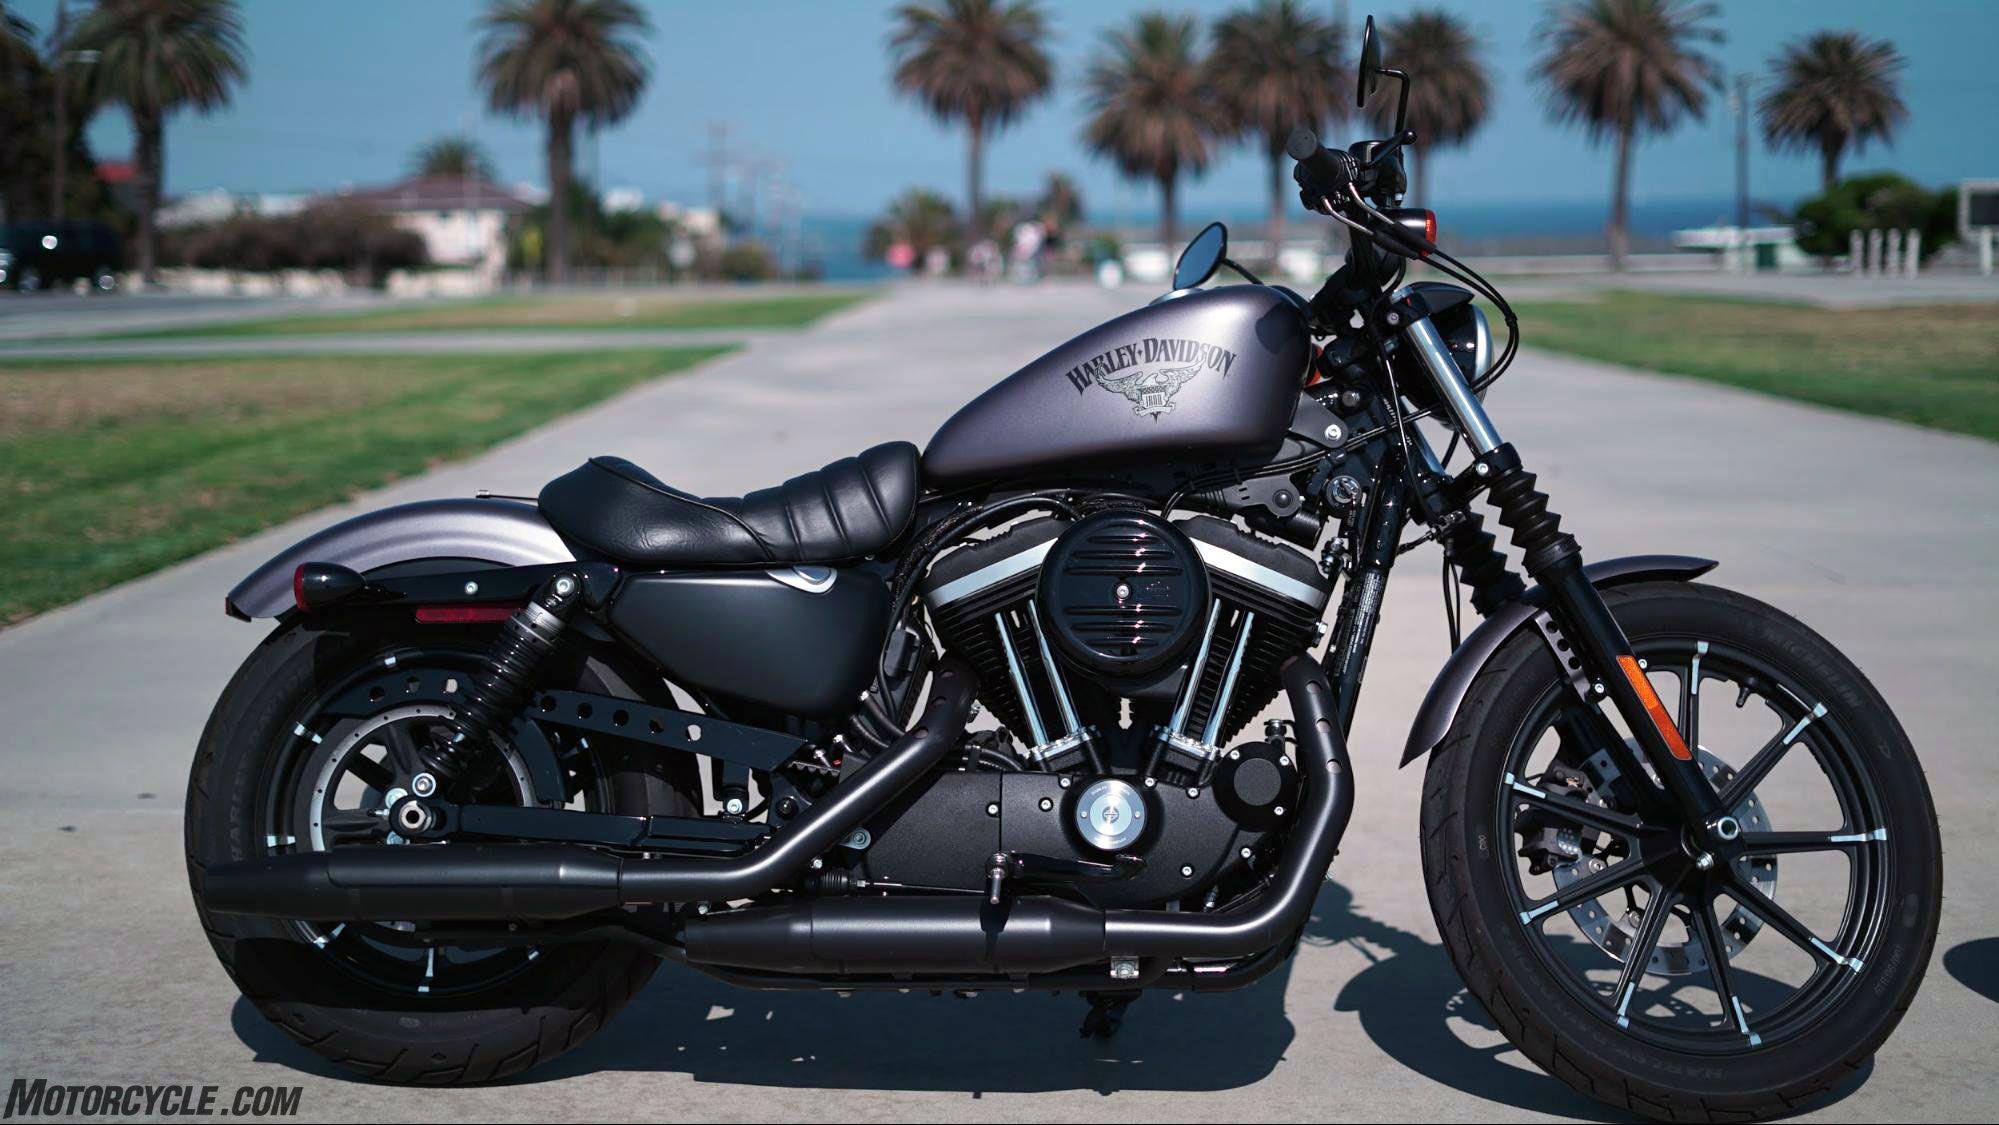 060216 9k shootout harley iron 883 1999 1125 best motorcycles pinterest iron. Black Bedroom Furniture Sets. Home Design Ideas